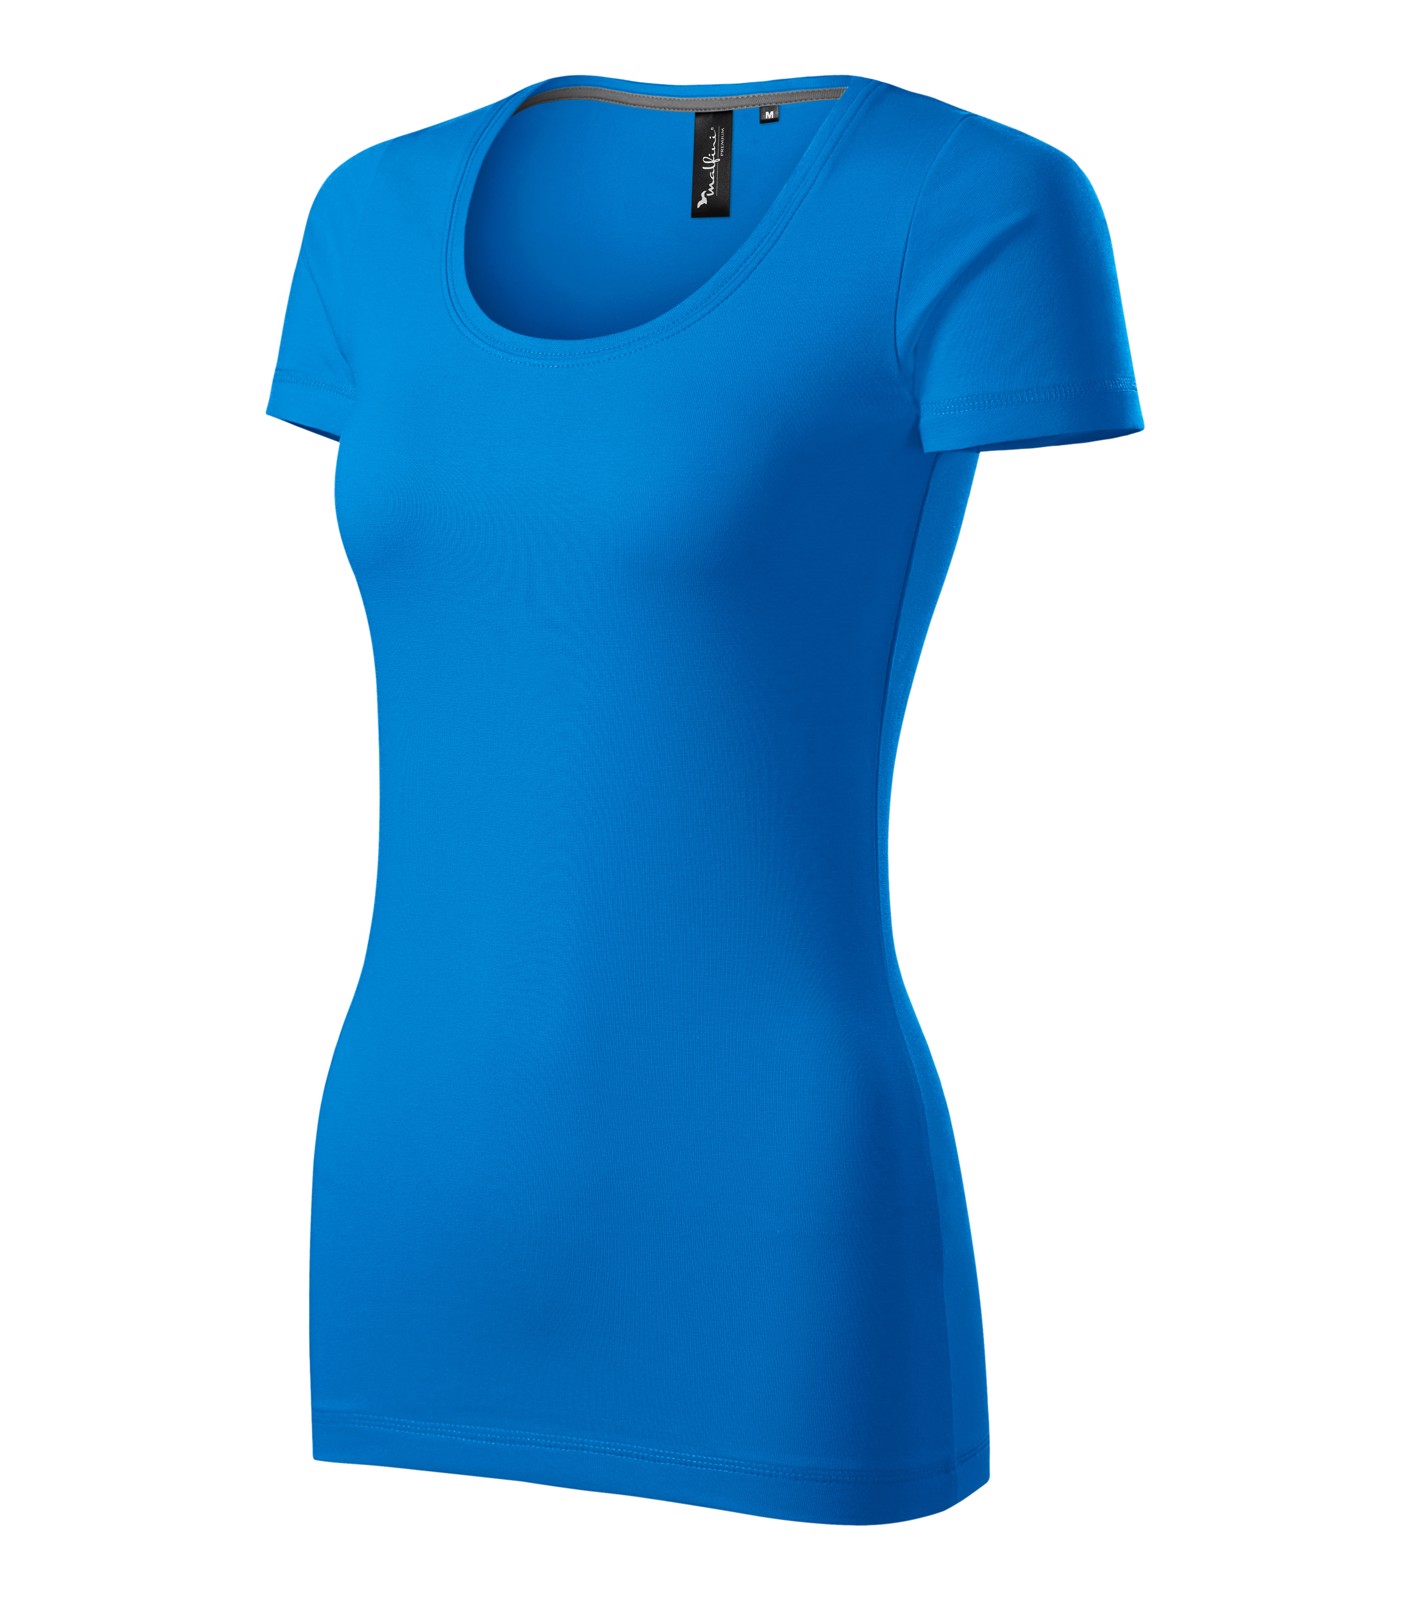 Tričko dámské Malfinipremium Action - Snorkel Blue / XL